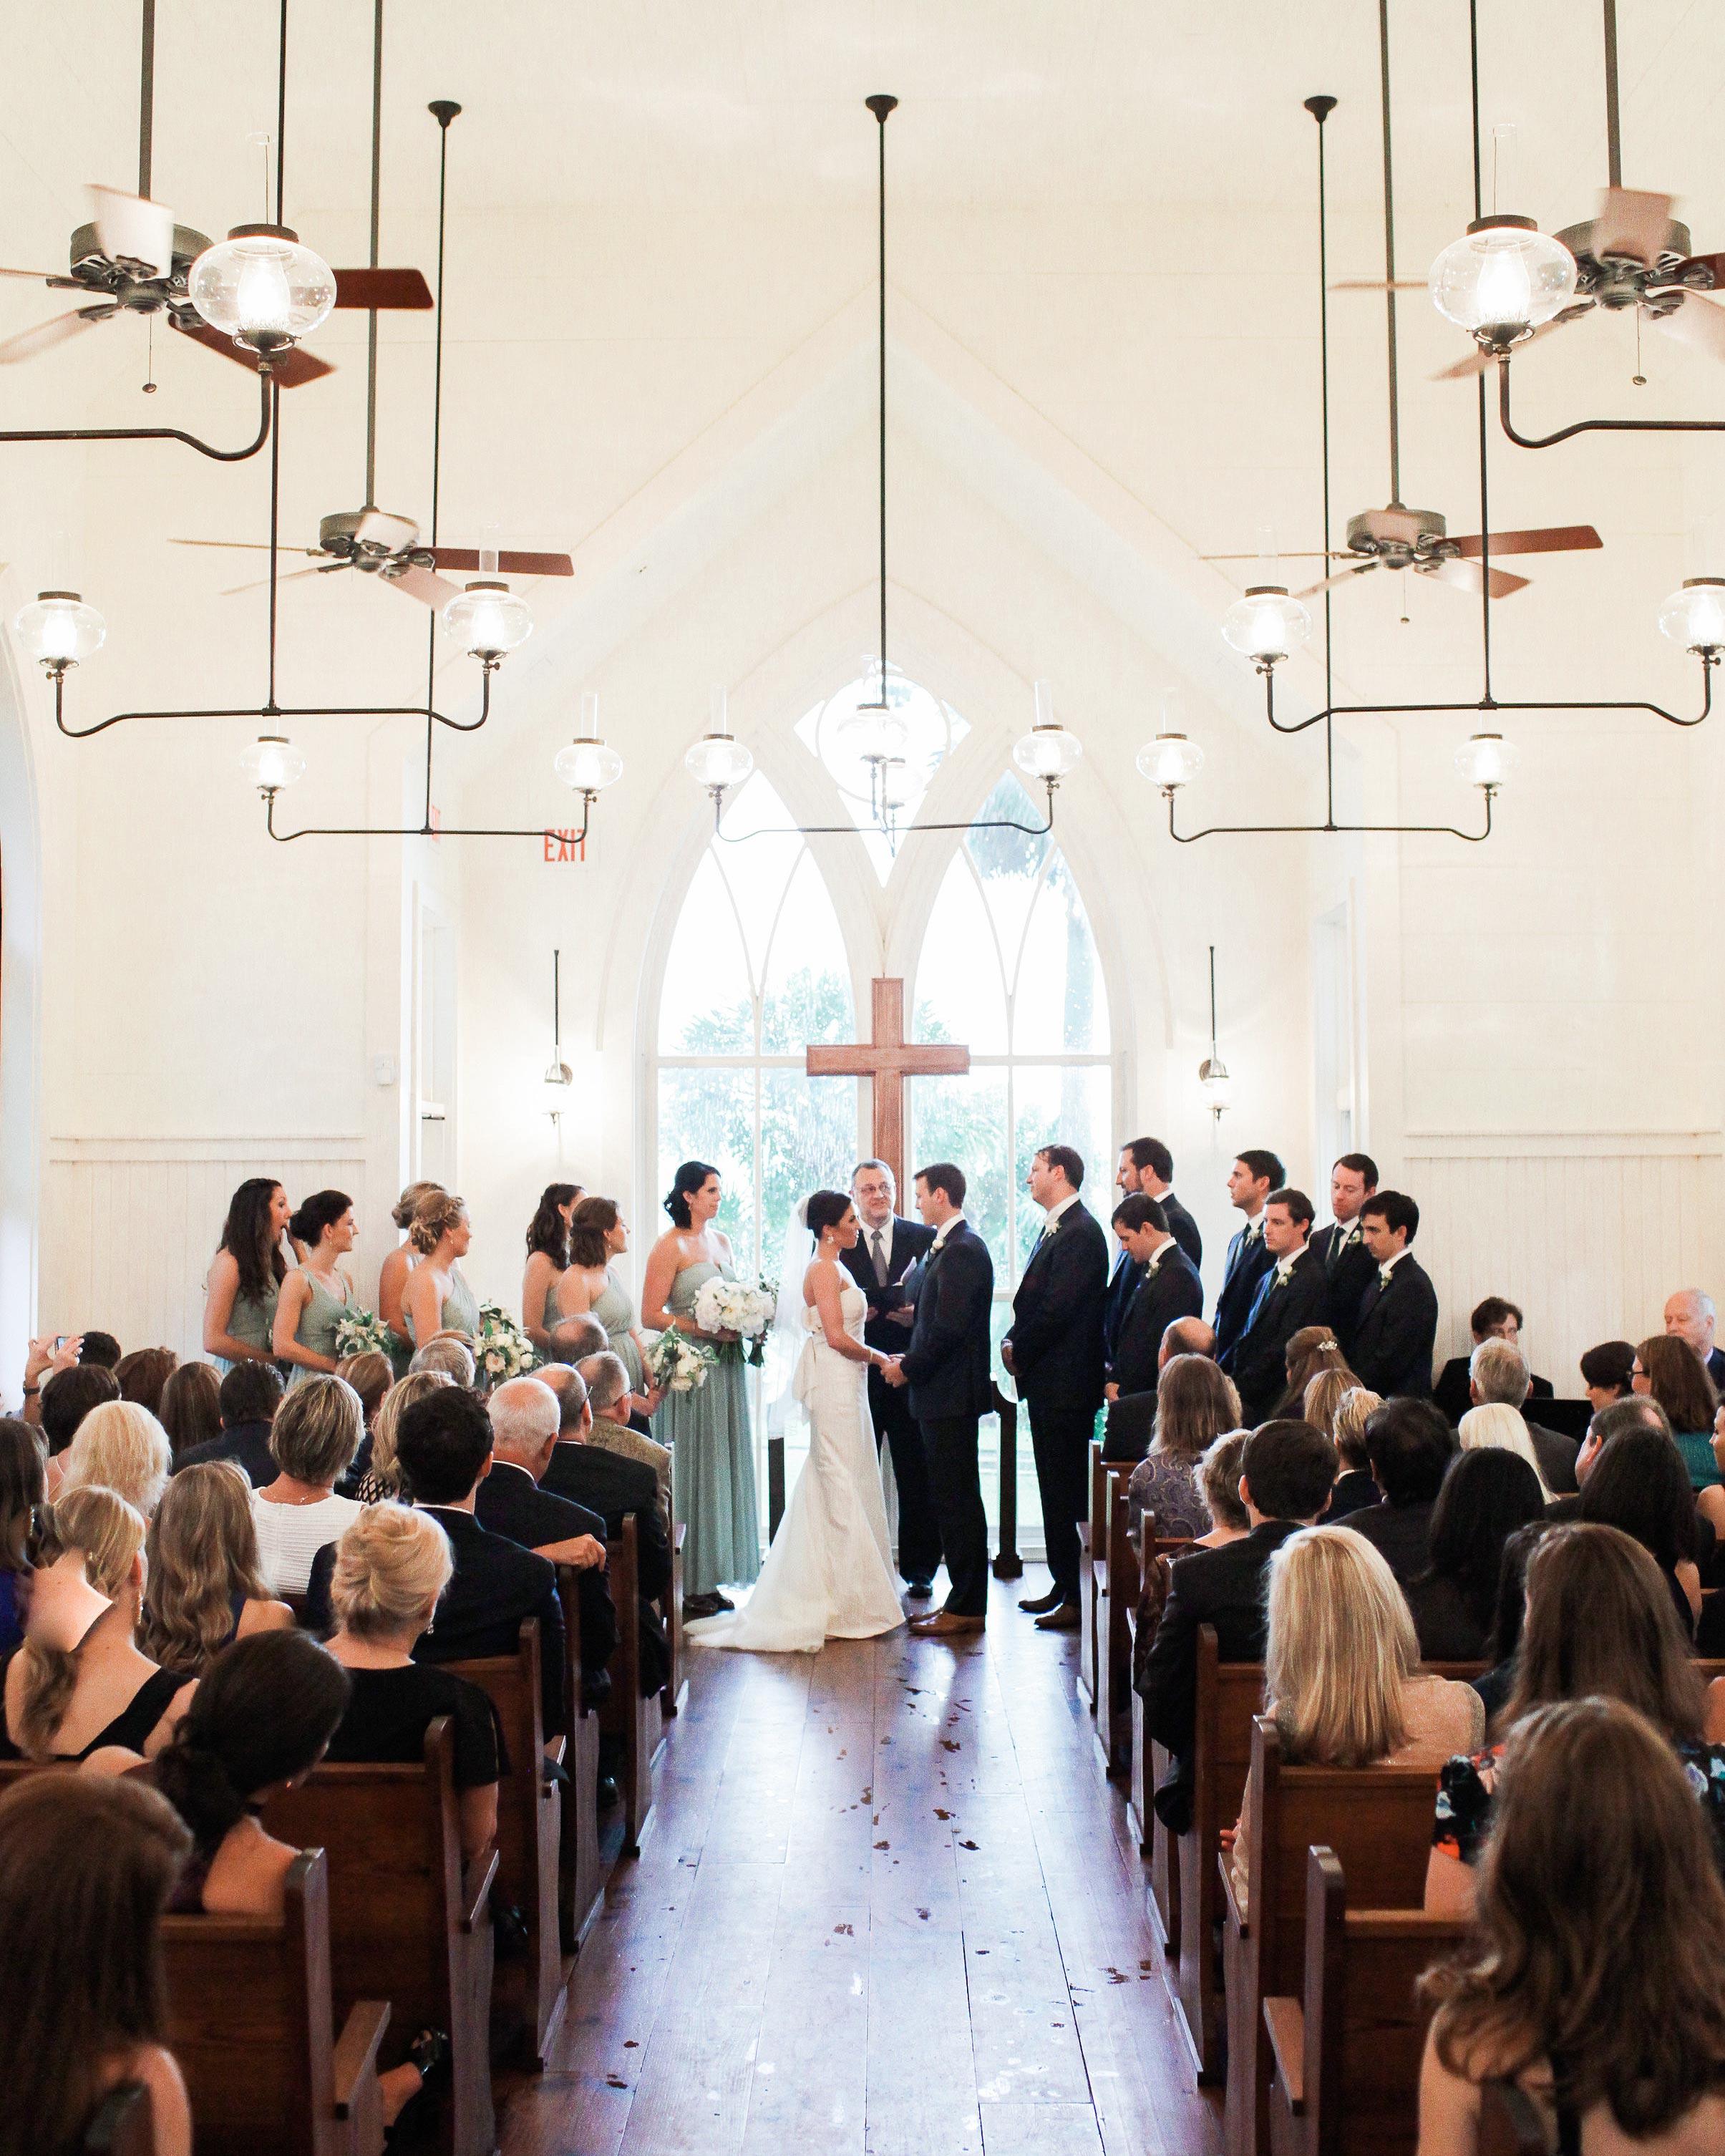 taylor-john-wedding-ceremony-church-112-s113035-0616.jpg